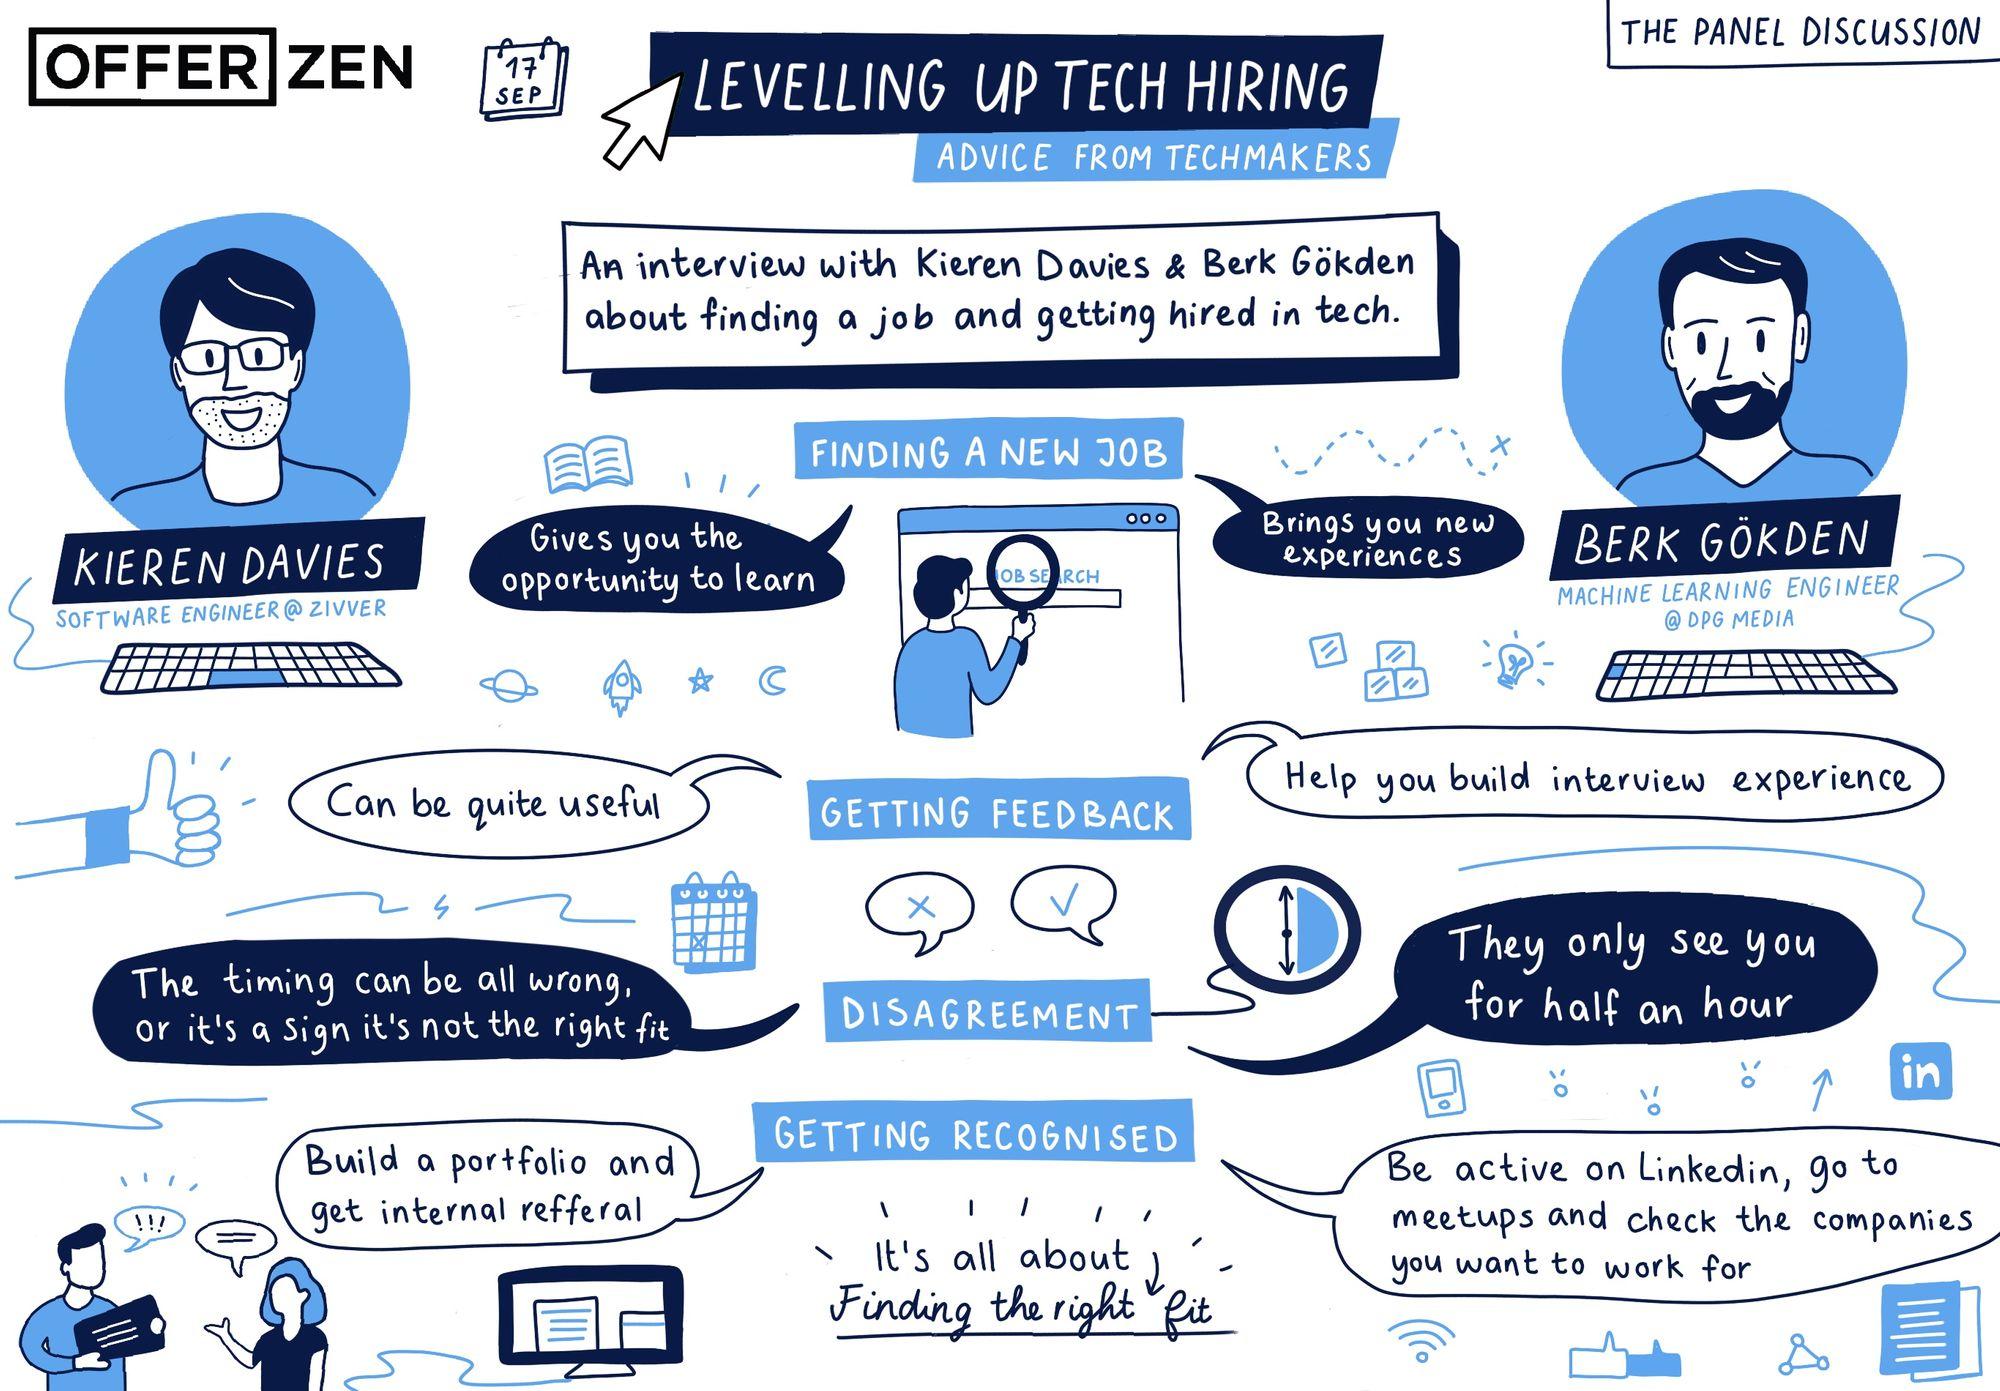 Levelling_Up_Tech_Hiring_2_V2